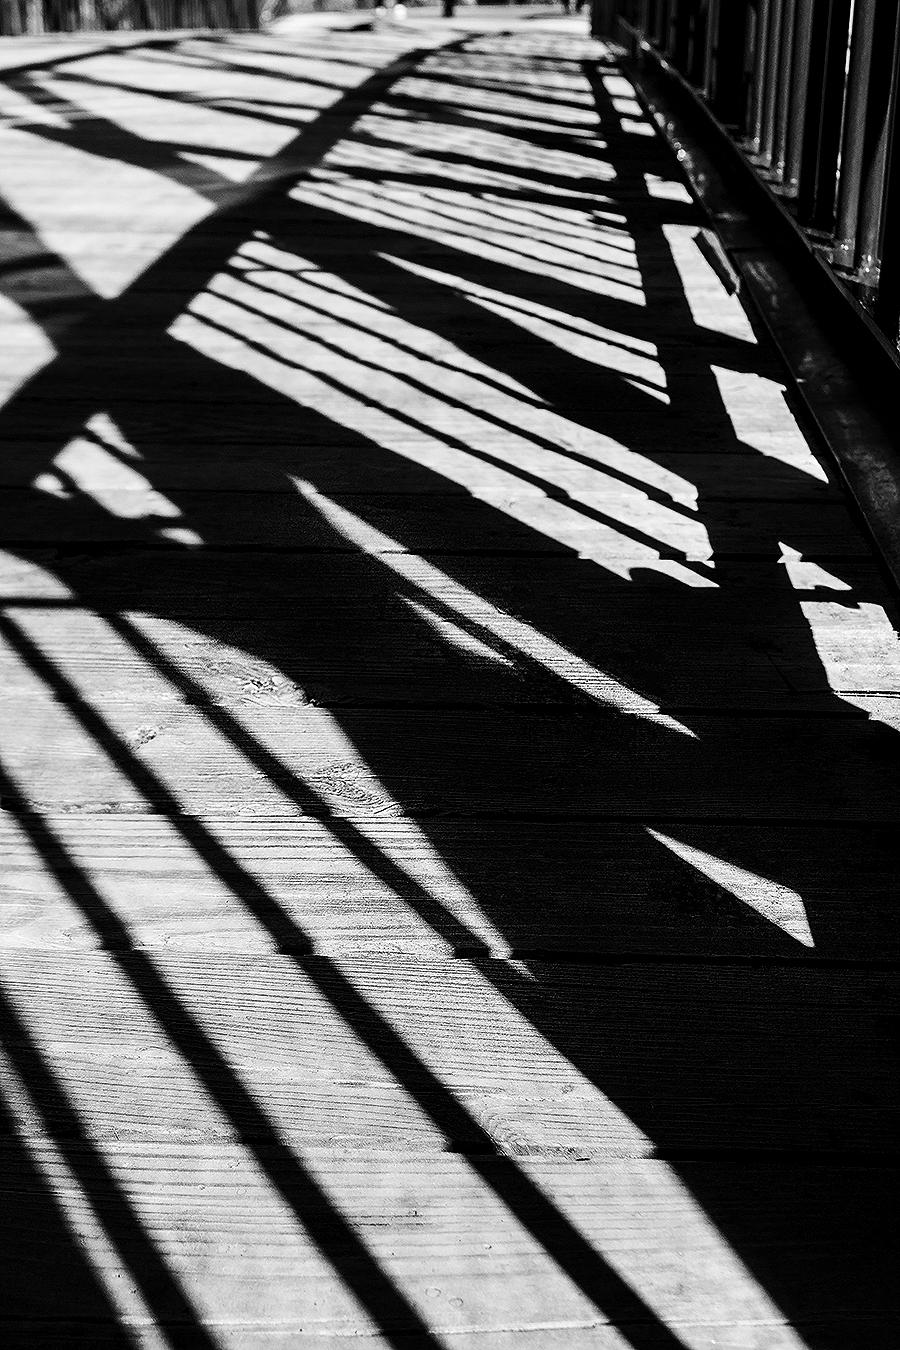 Janelle_Tong_Photography_Tony_Ward_Studio_Individual_Project_UPenn_Penn_Park_Bridges_Shadows_on_Wood_Black_and_White_2